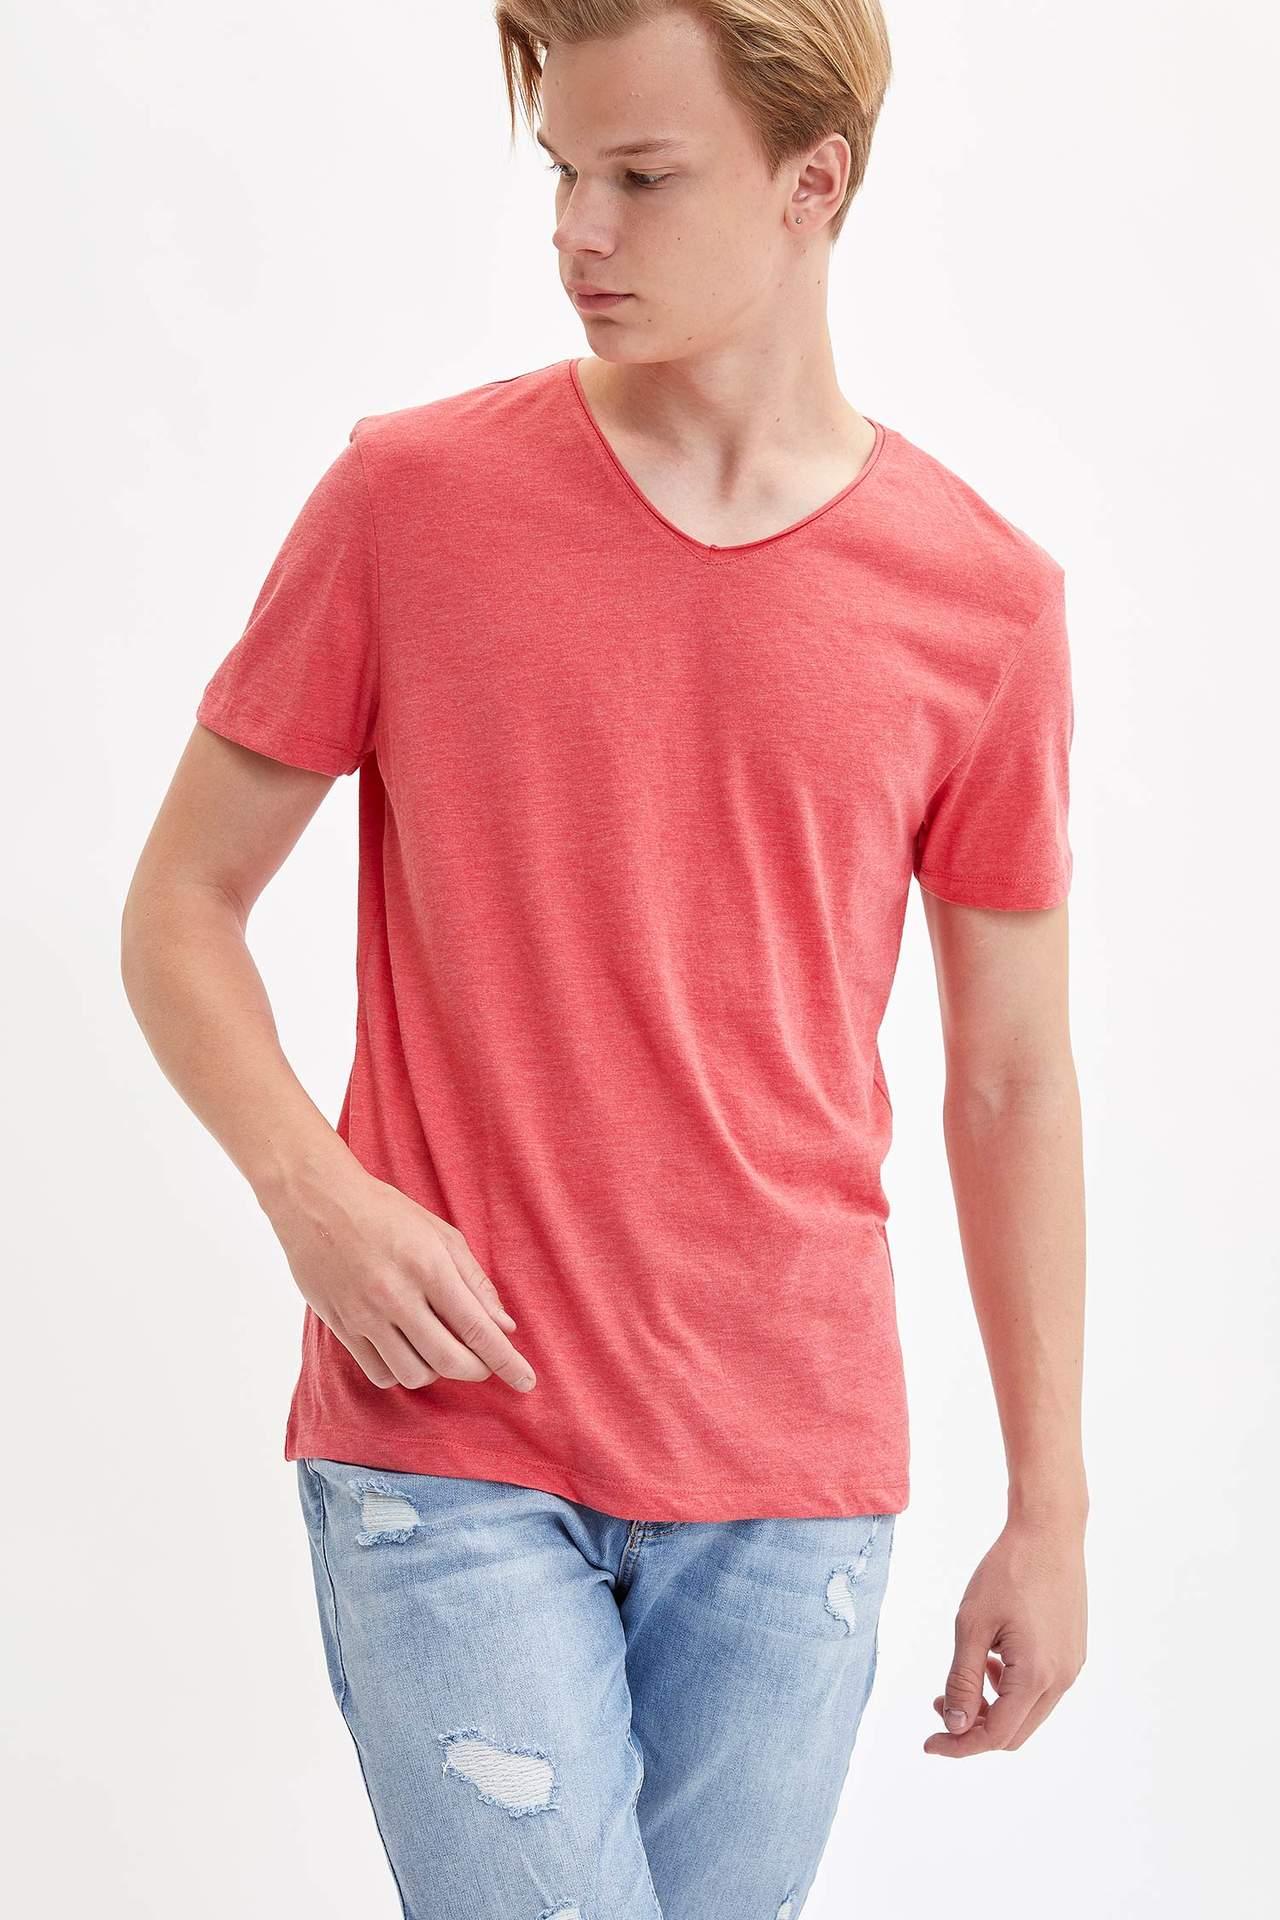 DeFacto Erkek V Yaka Slim Fit T-shirt Kırmızı male